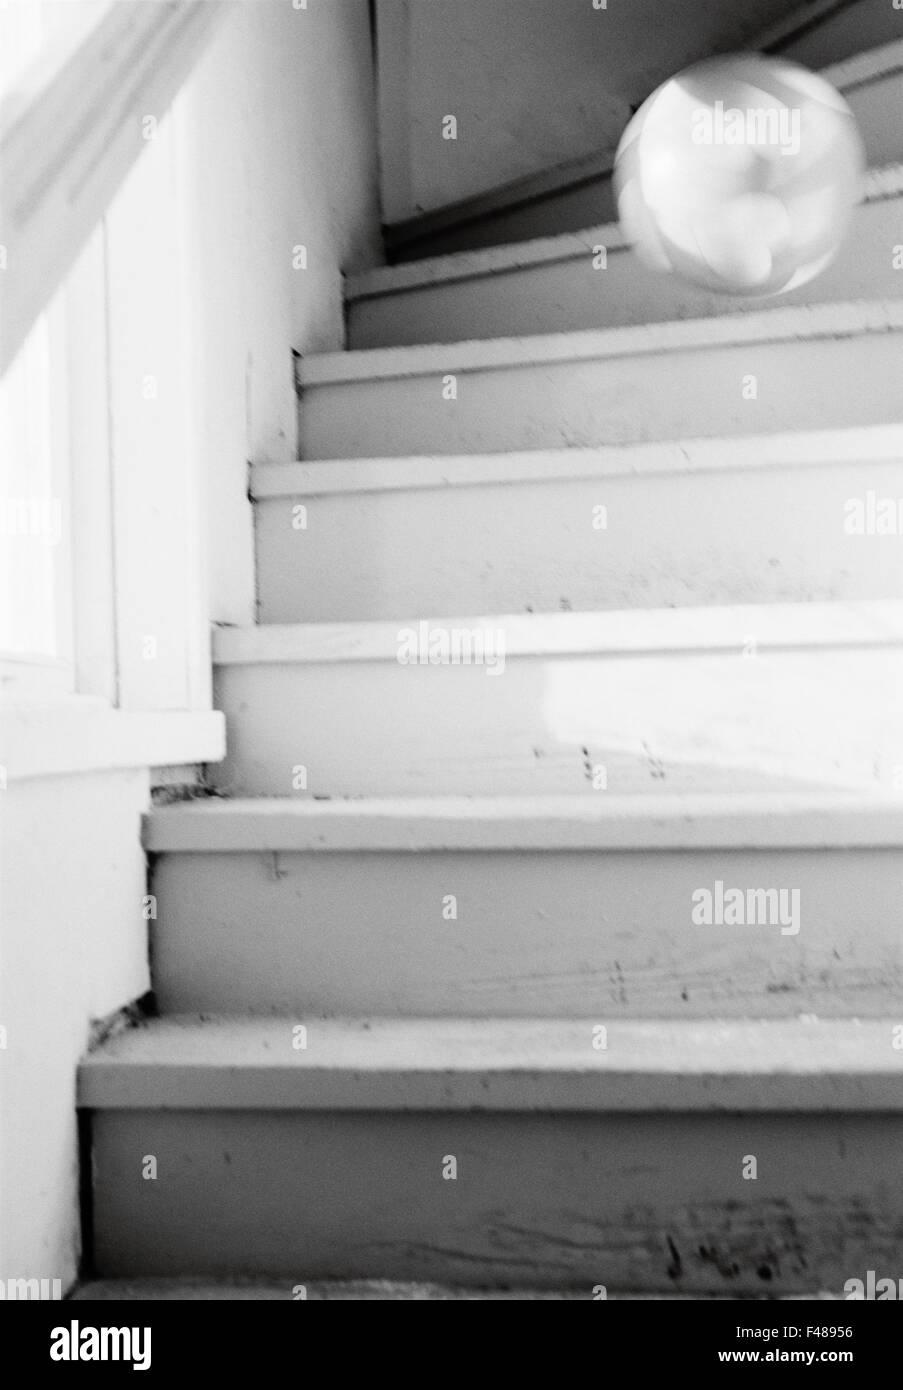 Un bal en bas de l'escalier, la Suède. Photo Stock